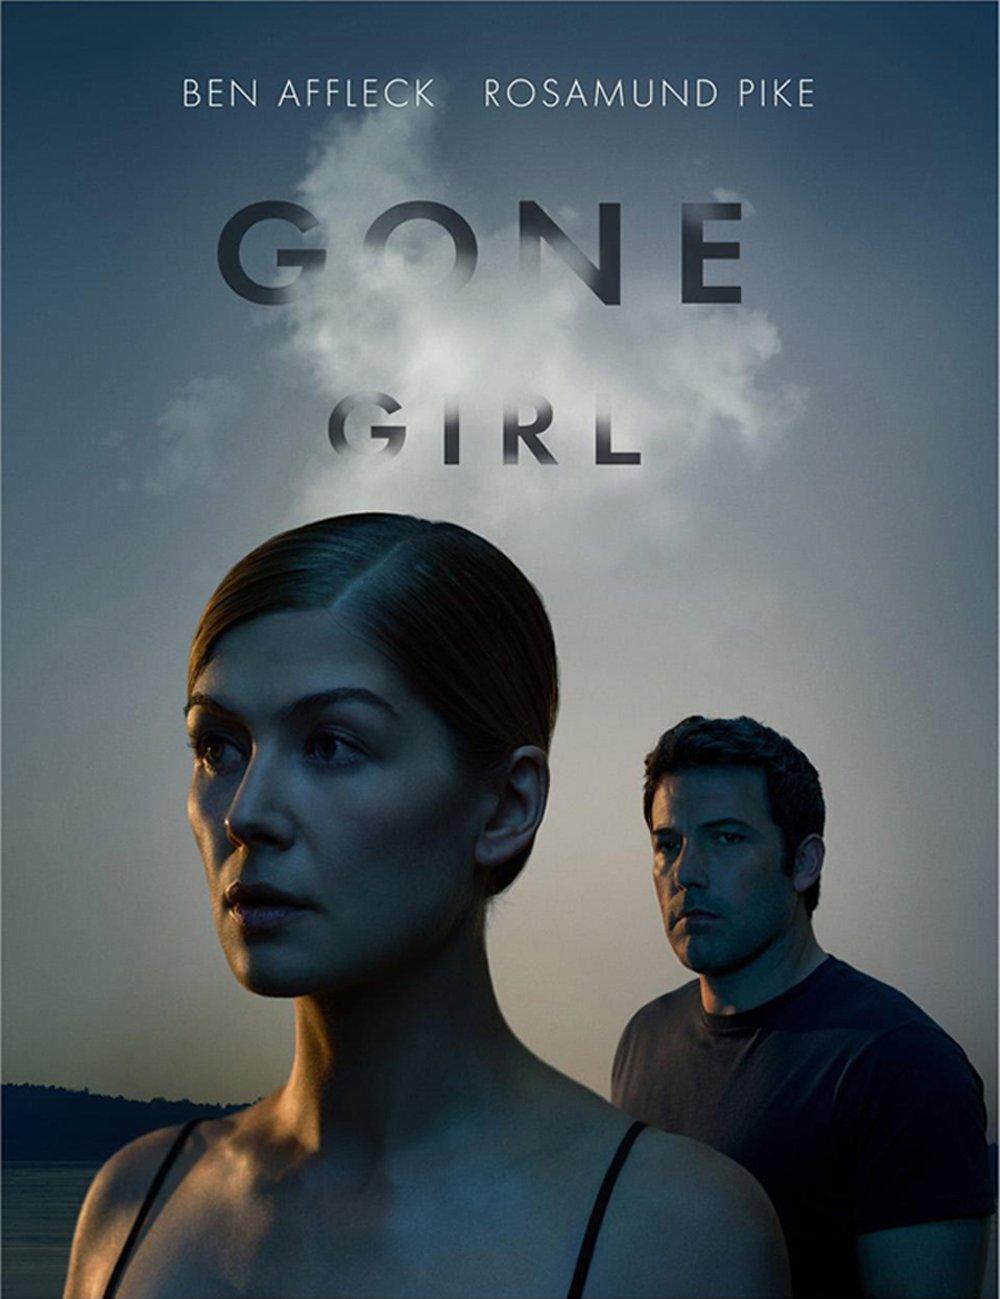 Review หนังดี) : Gone Girl (2014) - เมื่ออยู่ดีๆ เมียก็หายตัวไป  ทำให้ชีวิตของผัวต้องตกนรกทั้งเป็น - Pantip